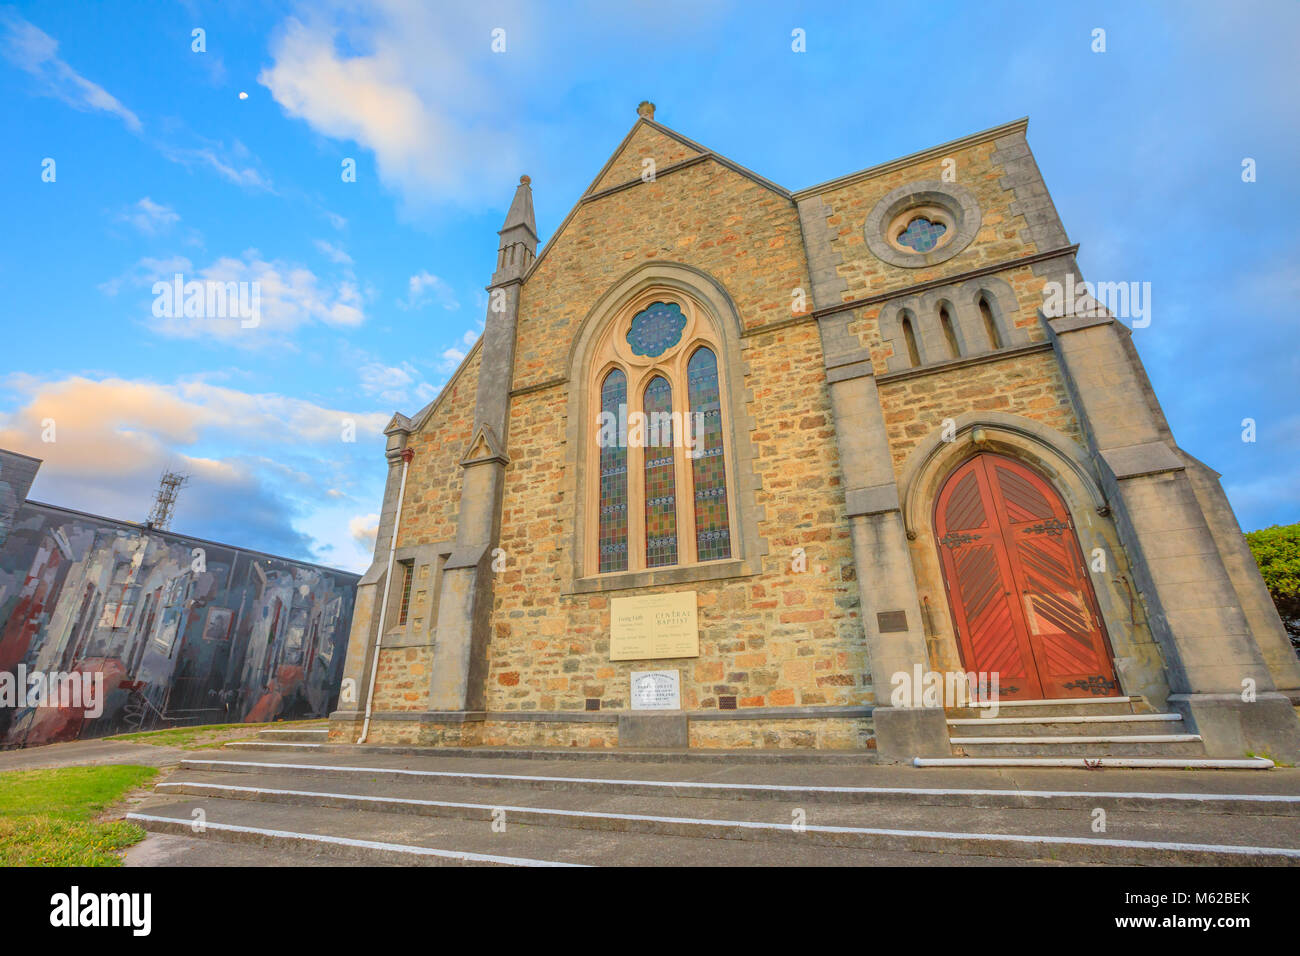 Albany, Australia - Dec 28, 2017: facade of Scots Uniting Church or Scots Presbyterian Church, in Victorian Gothic - Stock Image